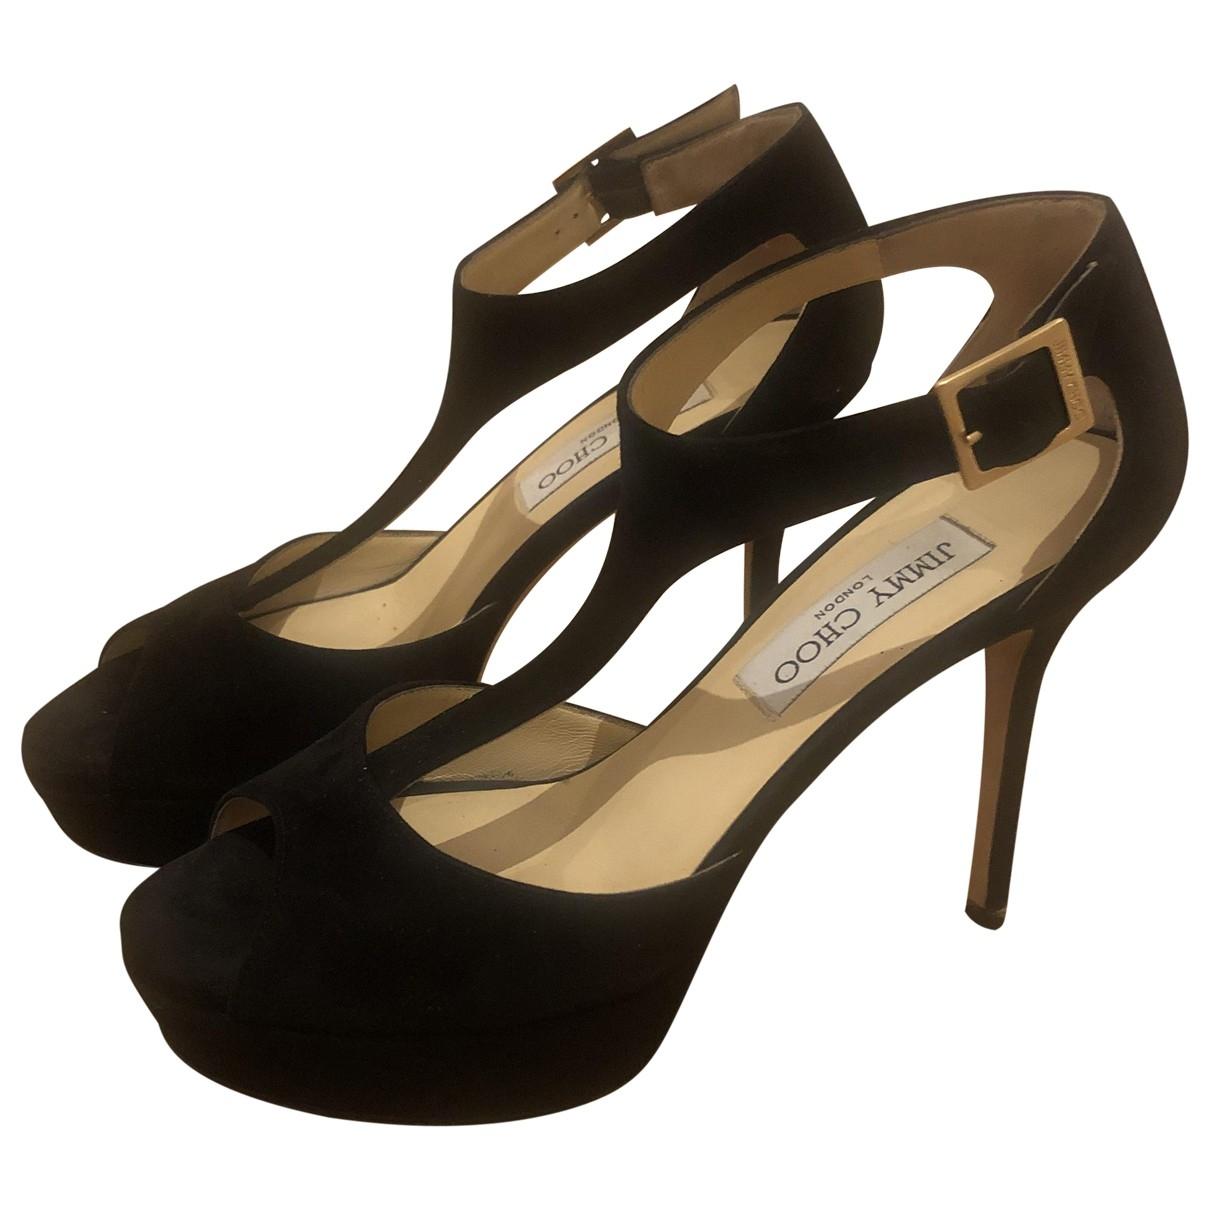 Jimmy Choo \N Black Suede Sandals for Women 37.5 EU